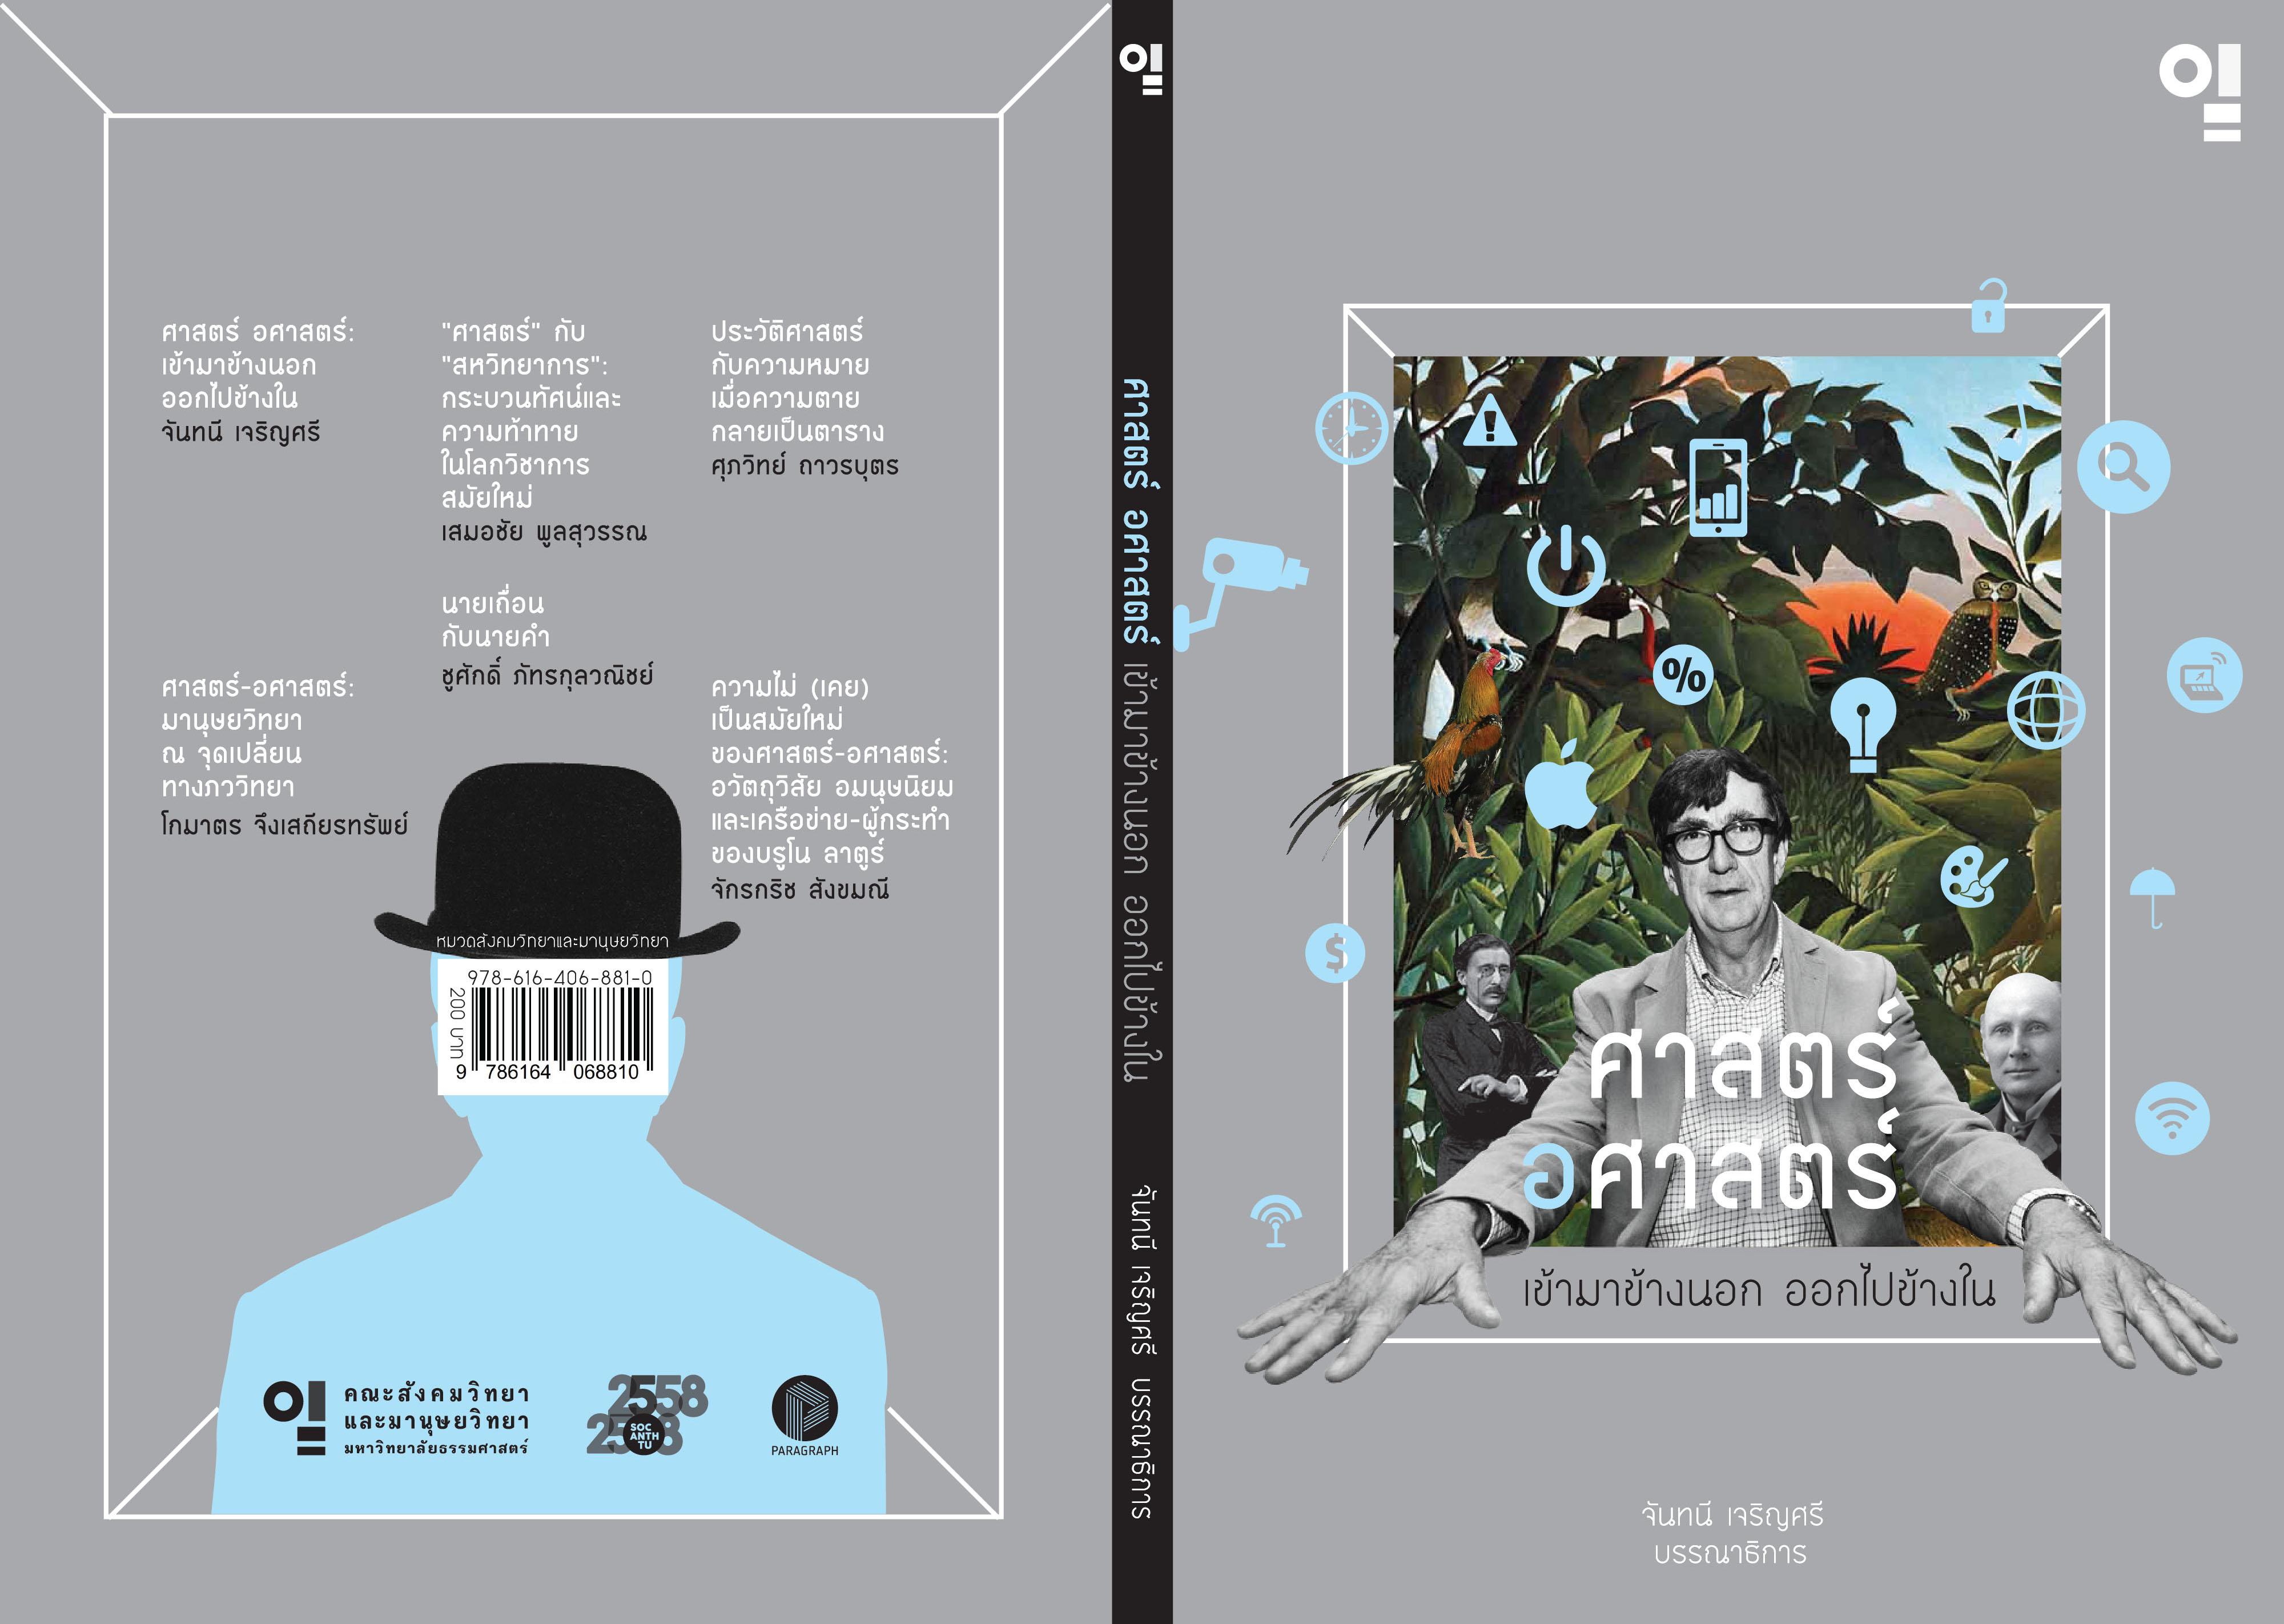 chantanee ed 2559 cover 1